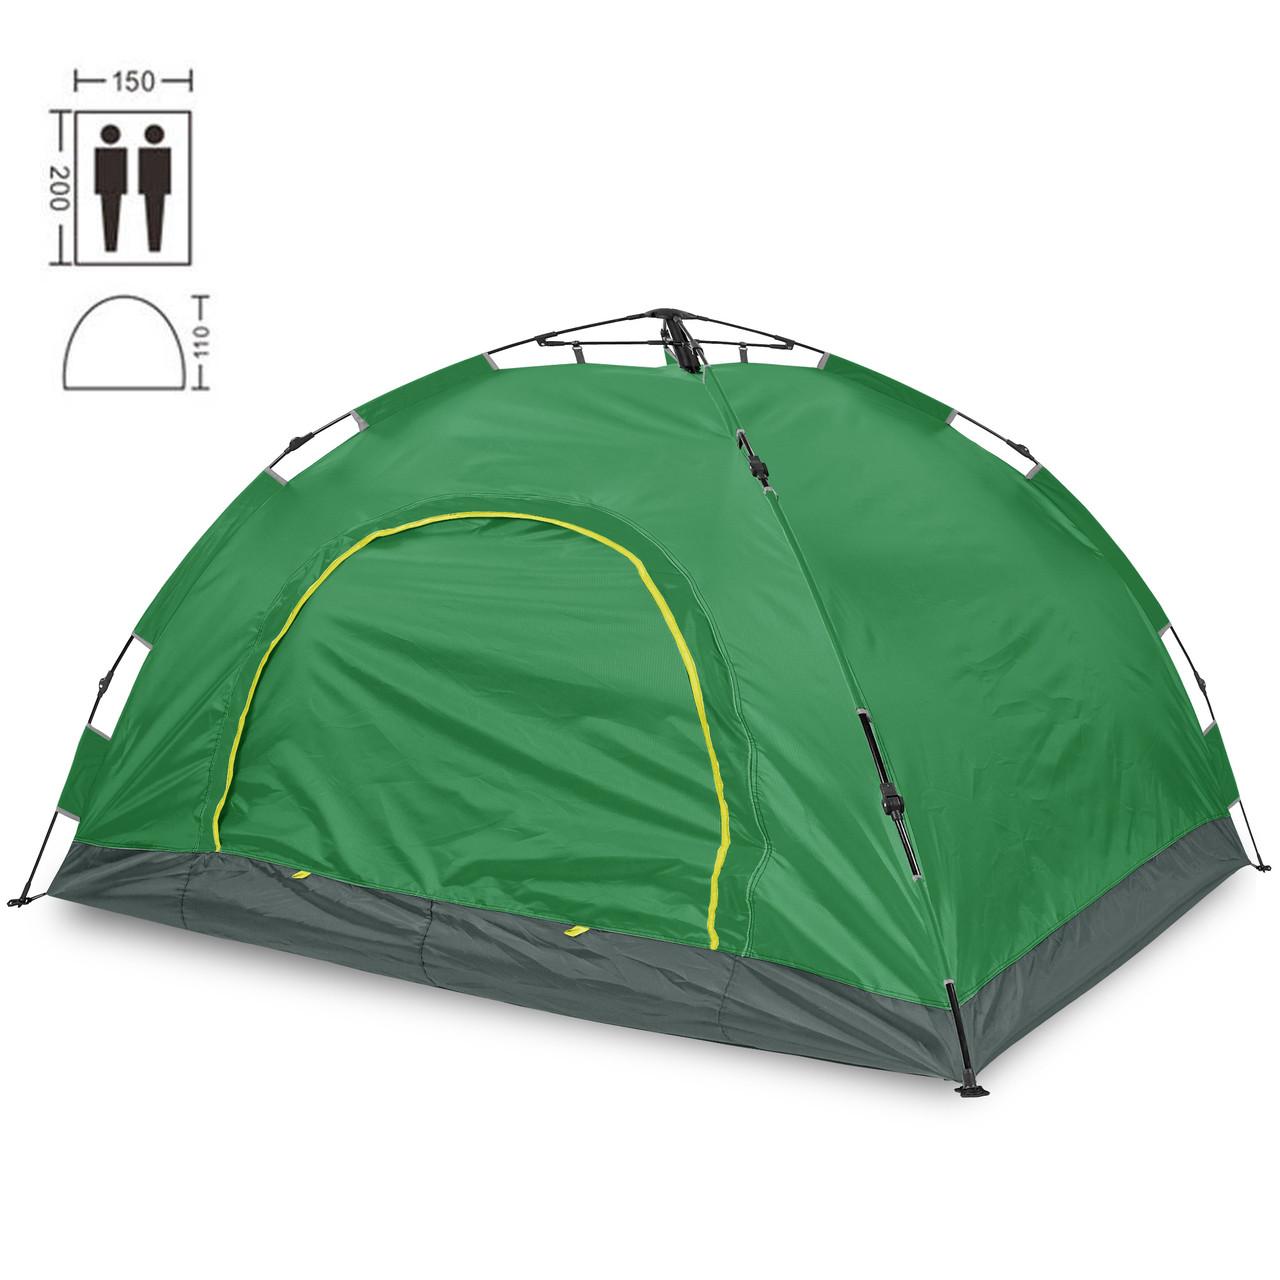 Палатка Автомат двухместная SY-A02-O